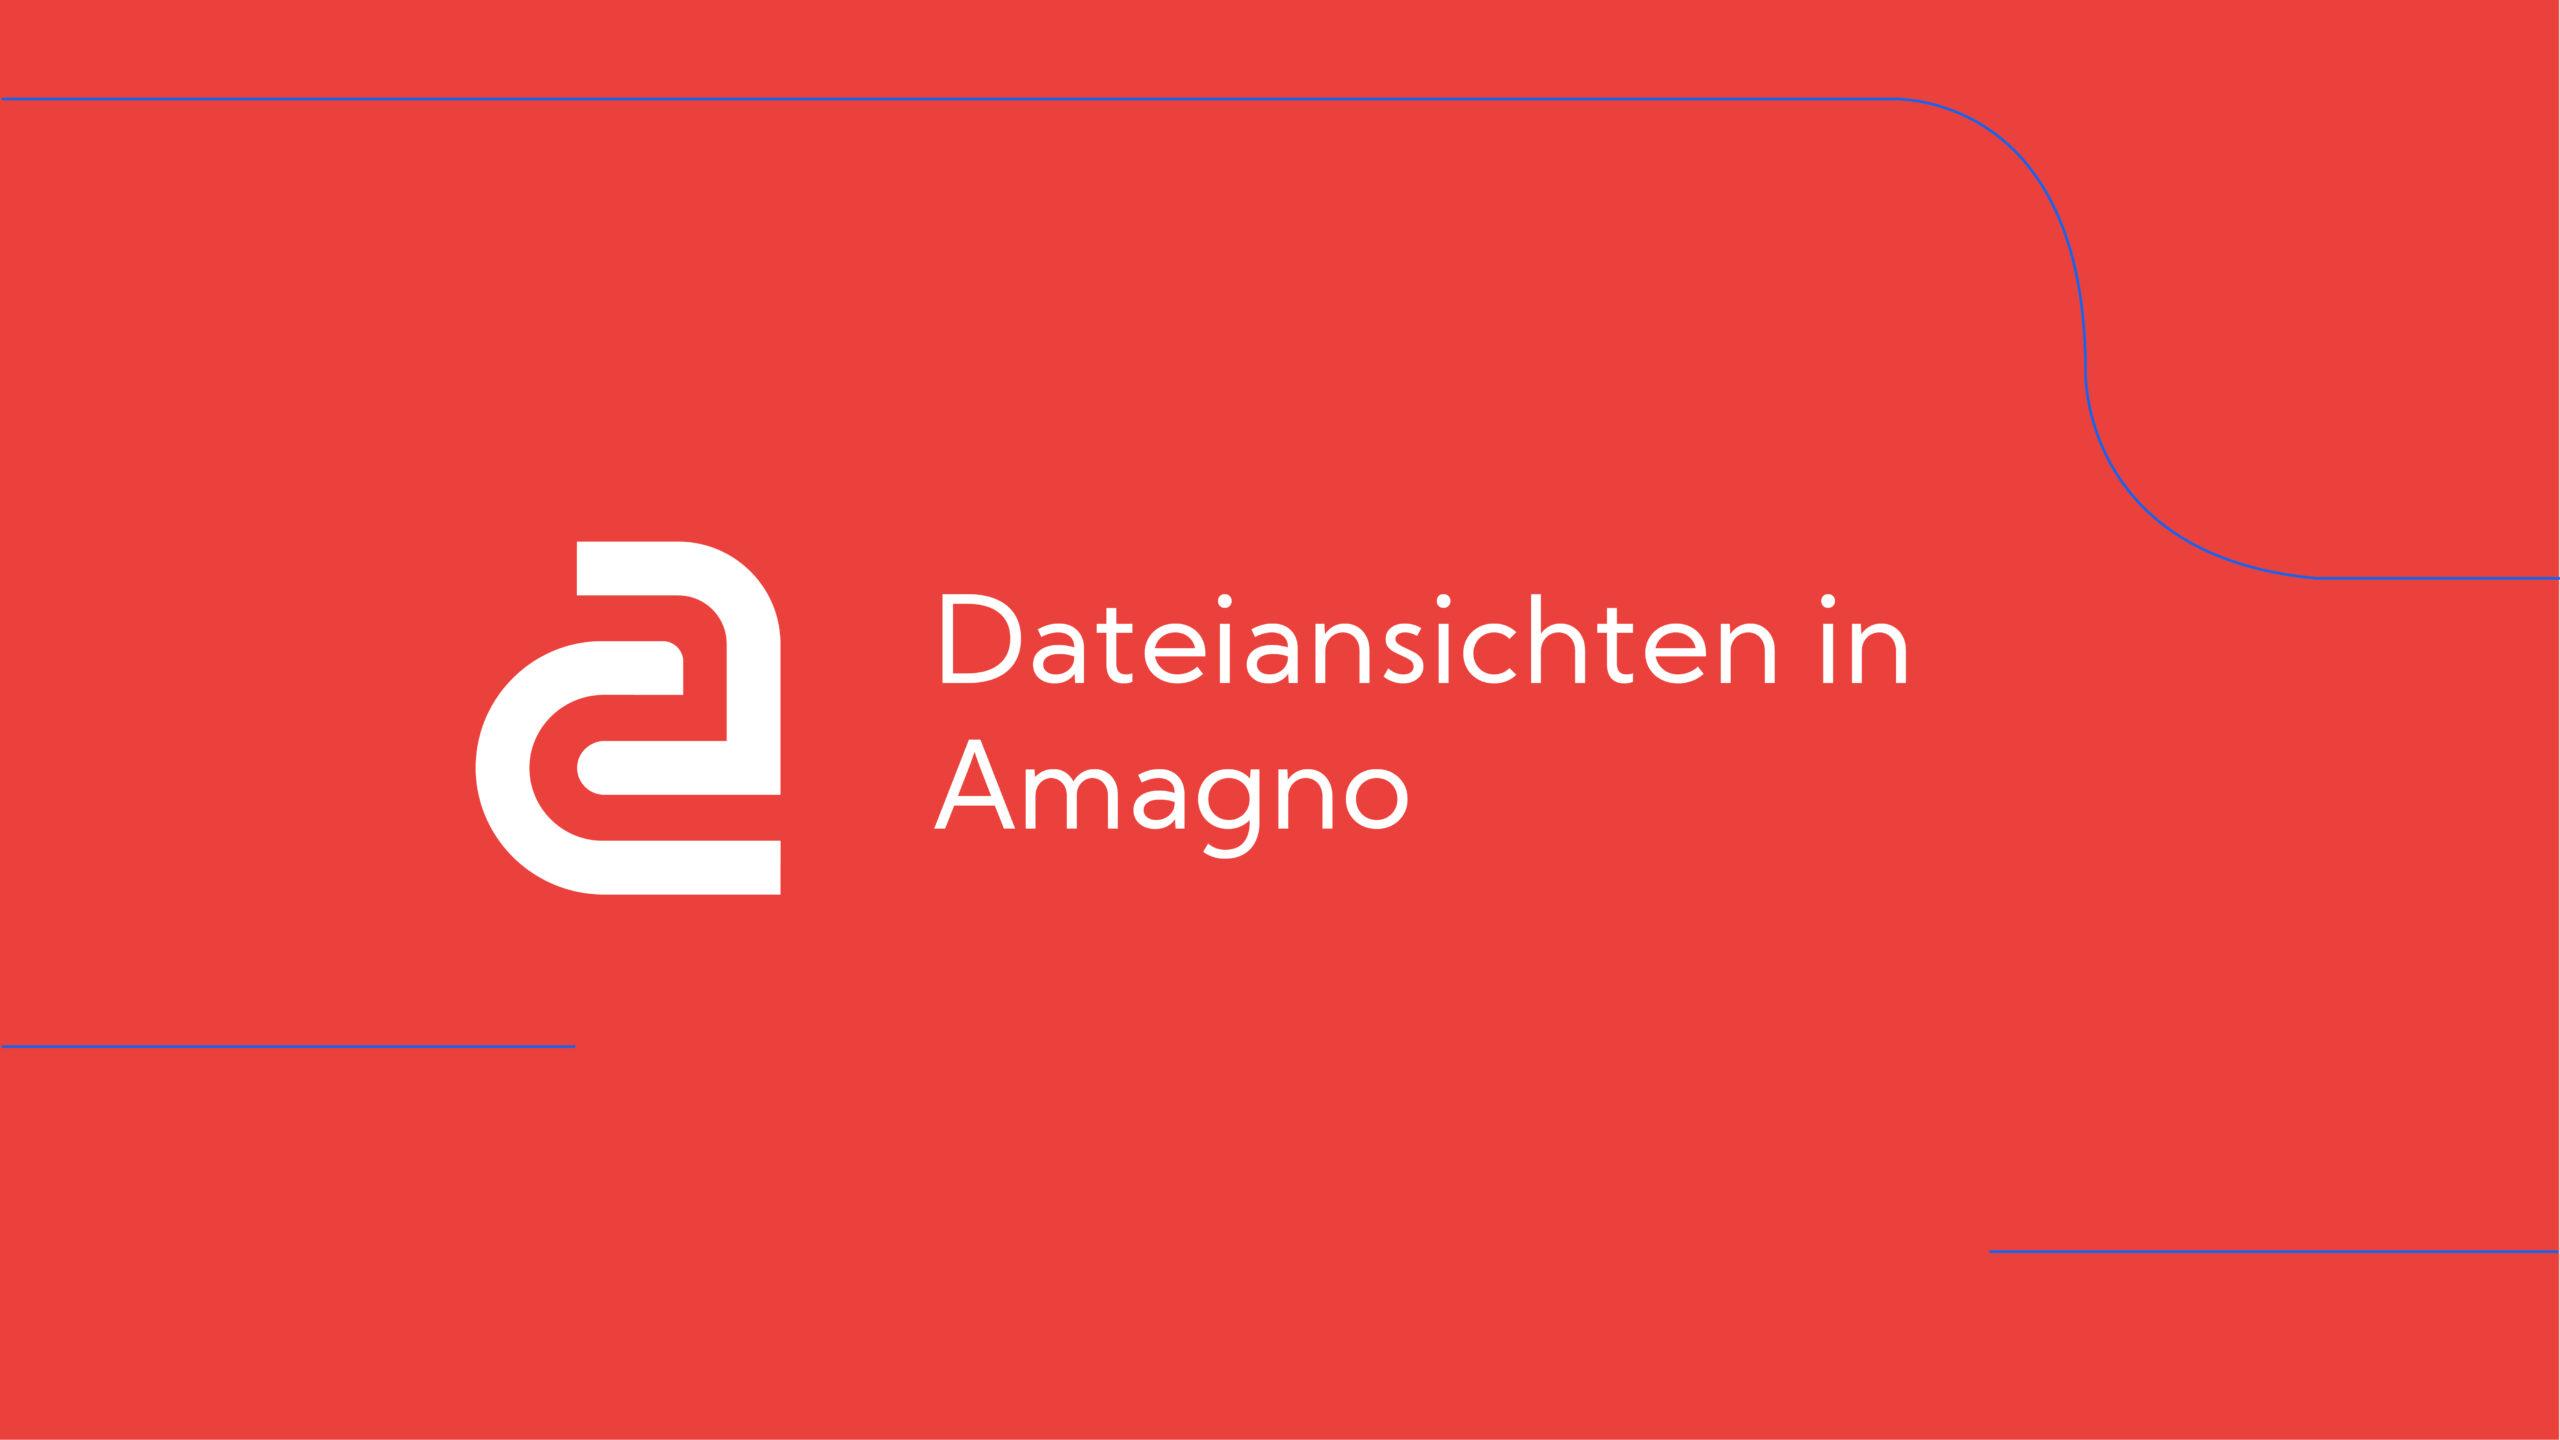 How-To: AMAGNO Basics – Dateiansichten